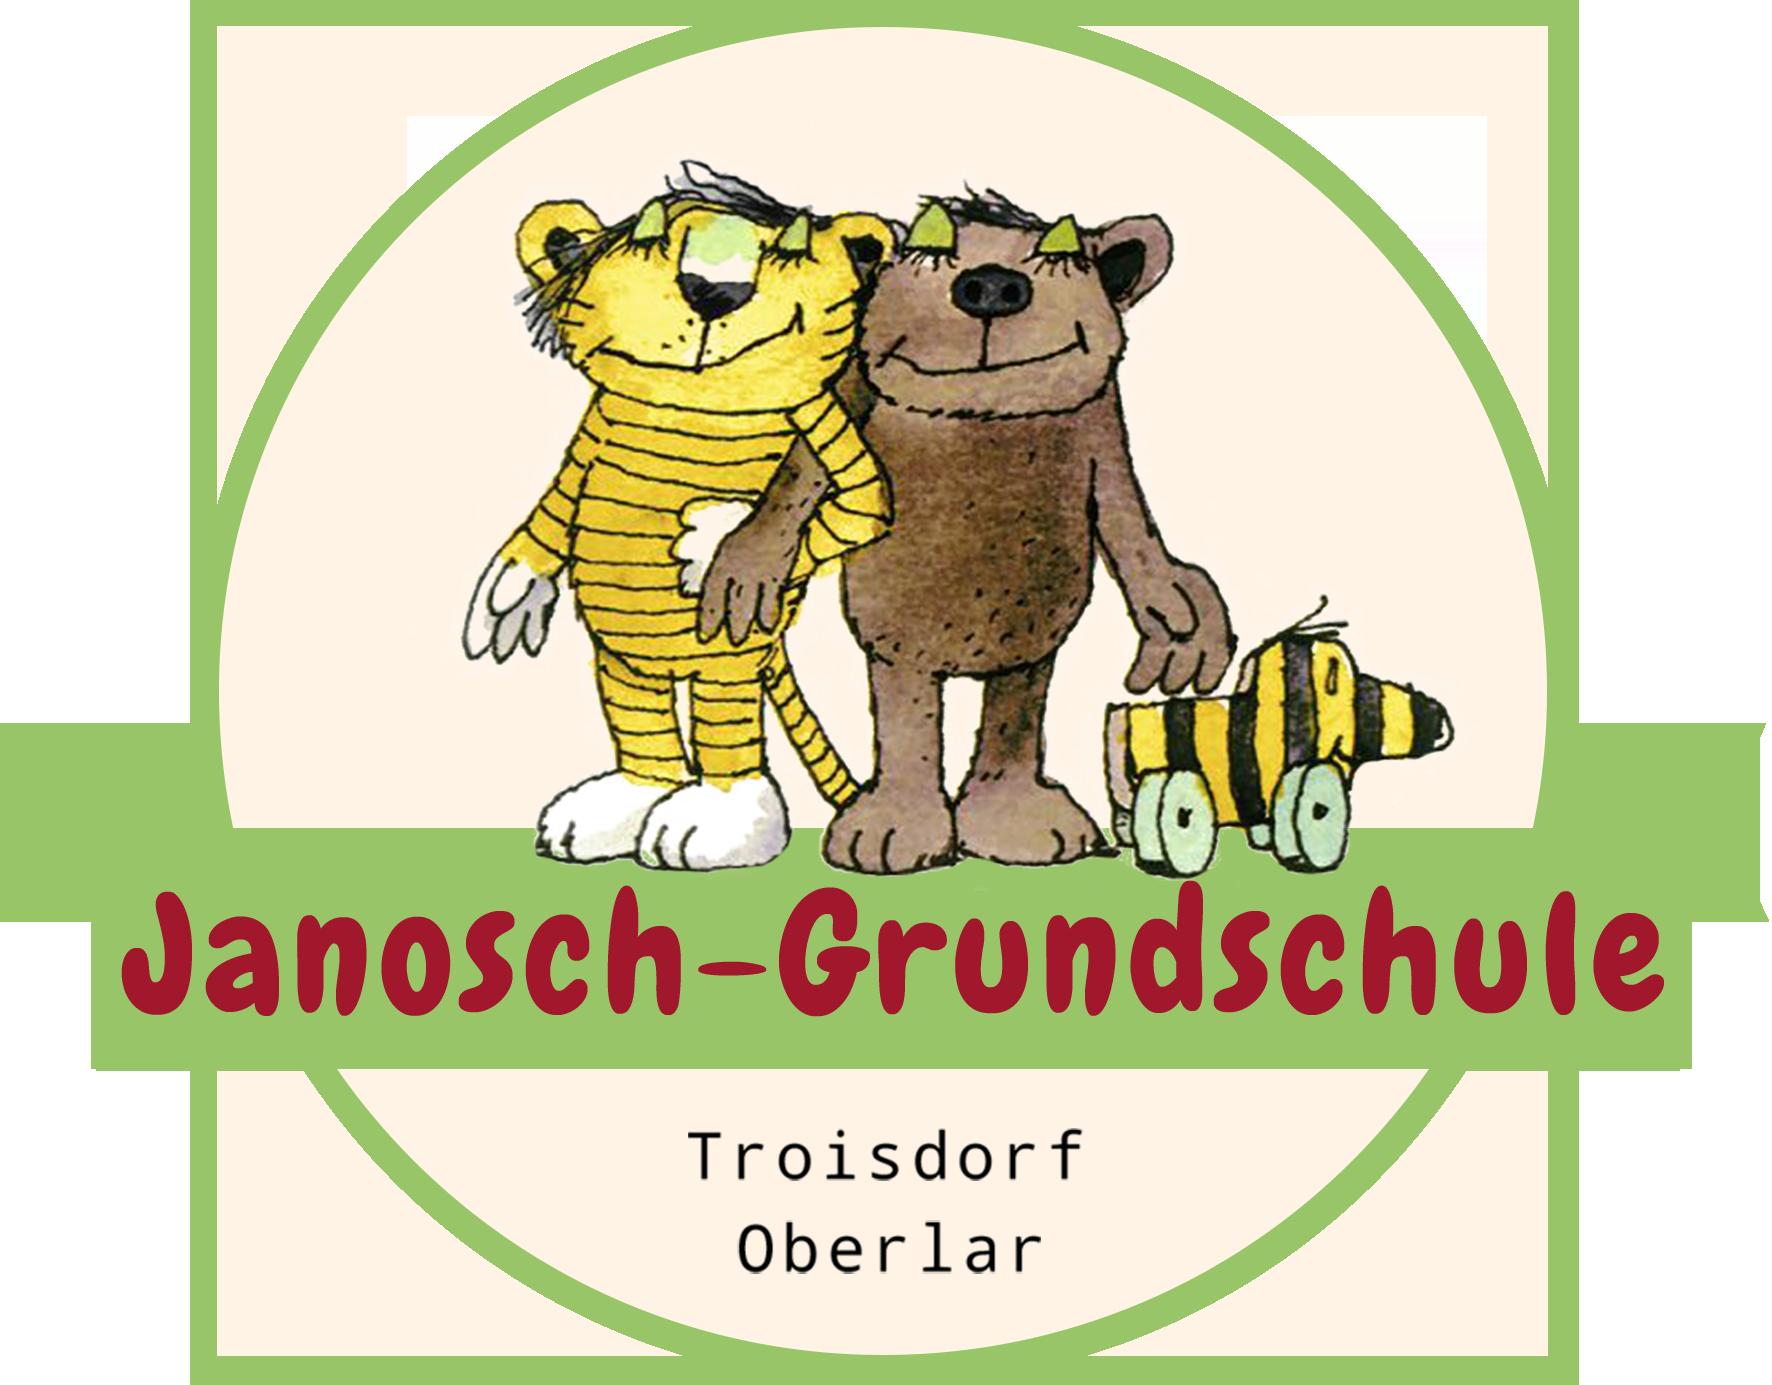 Janosch Grundschule Troisdorf-Oberlar